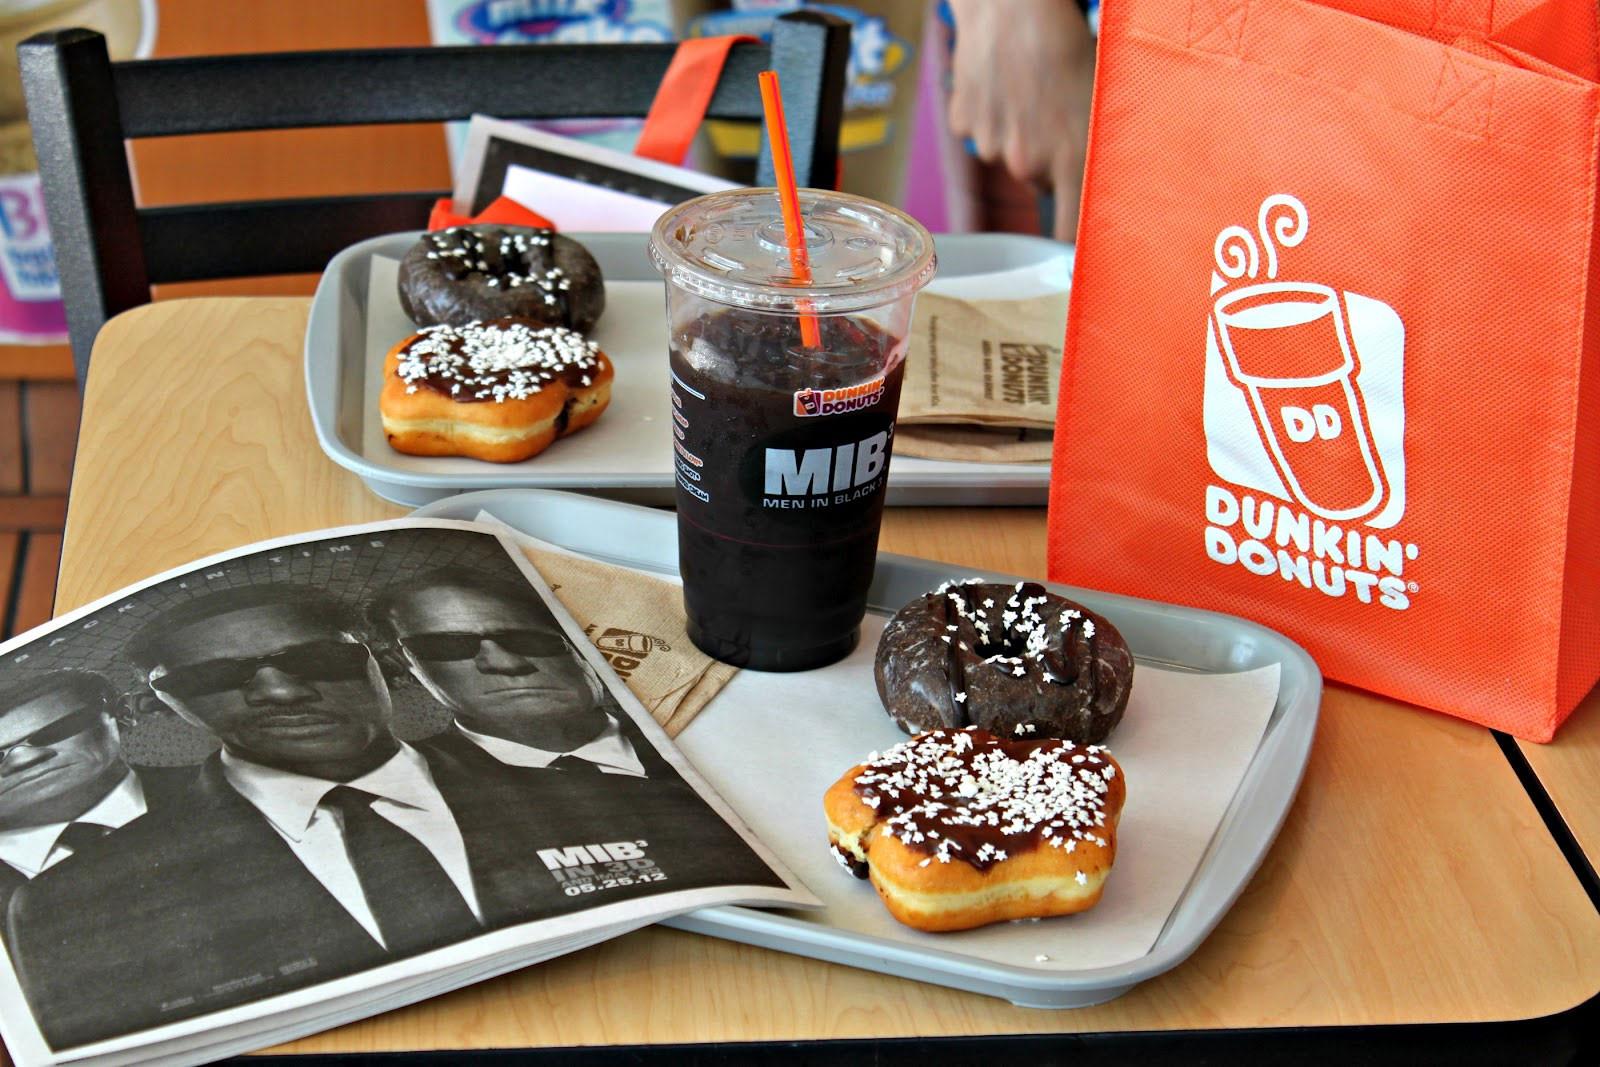 The Dunkin Donuts customer loyalty program